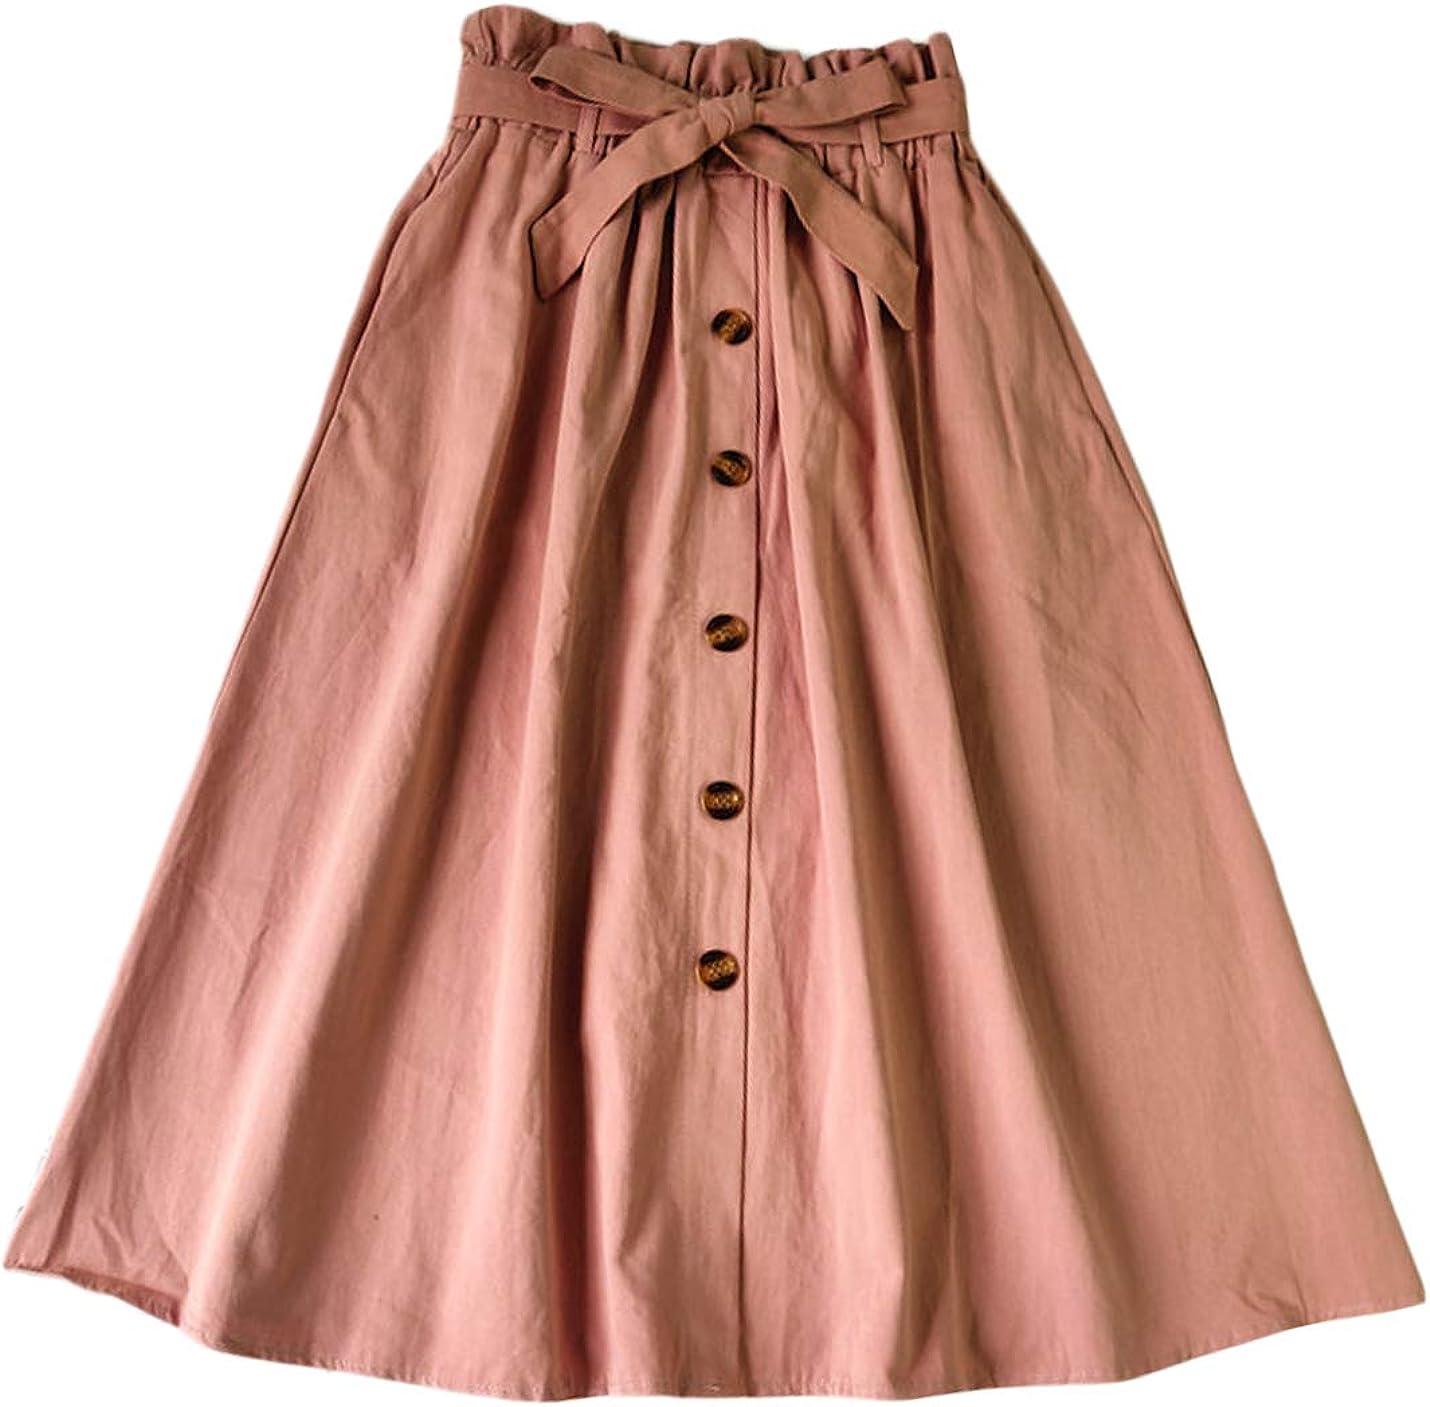 Jenkoon Women's Summer Elastic Waist Button Up Skirt Casual Pleated Skirt with Belt